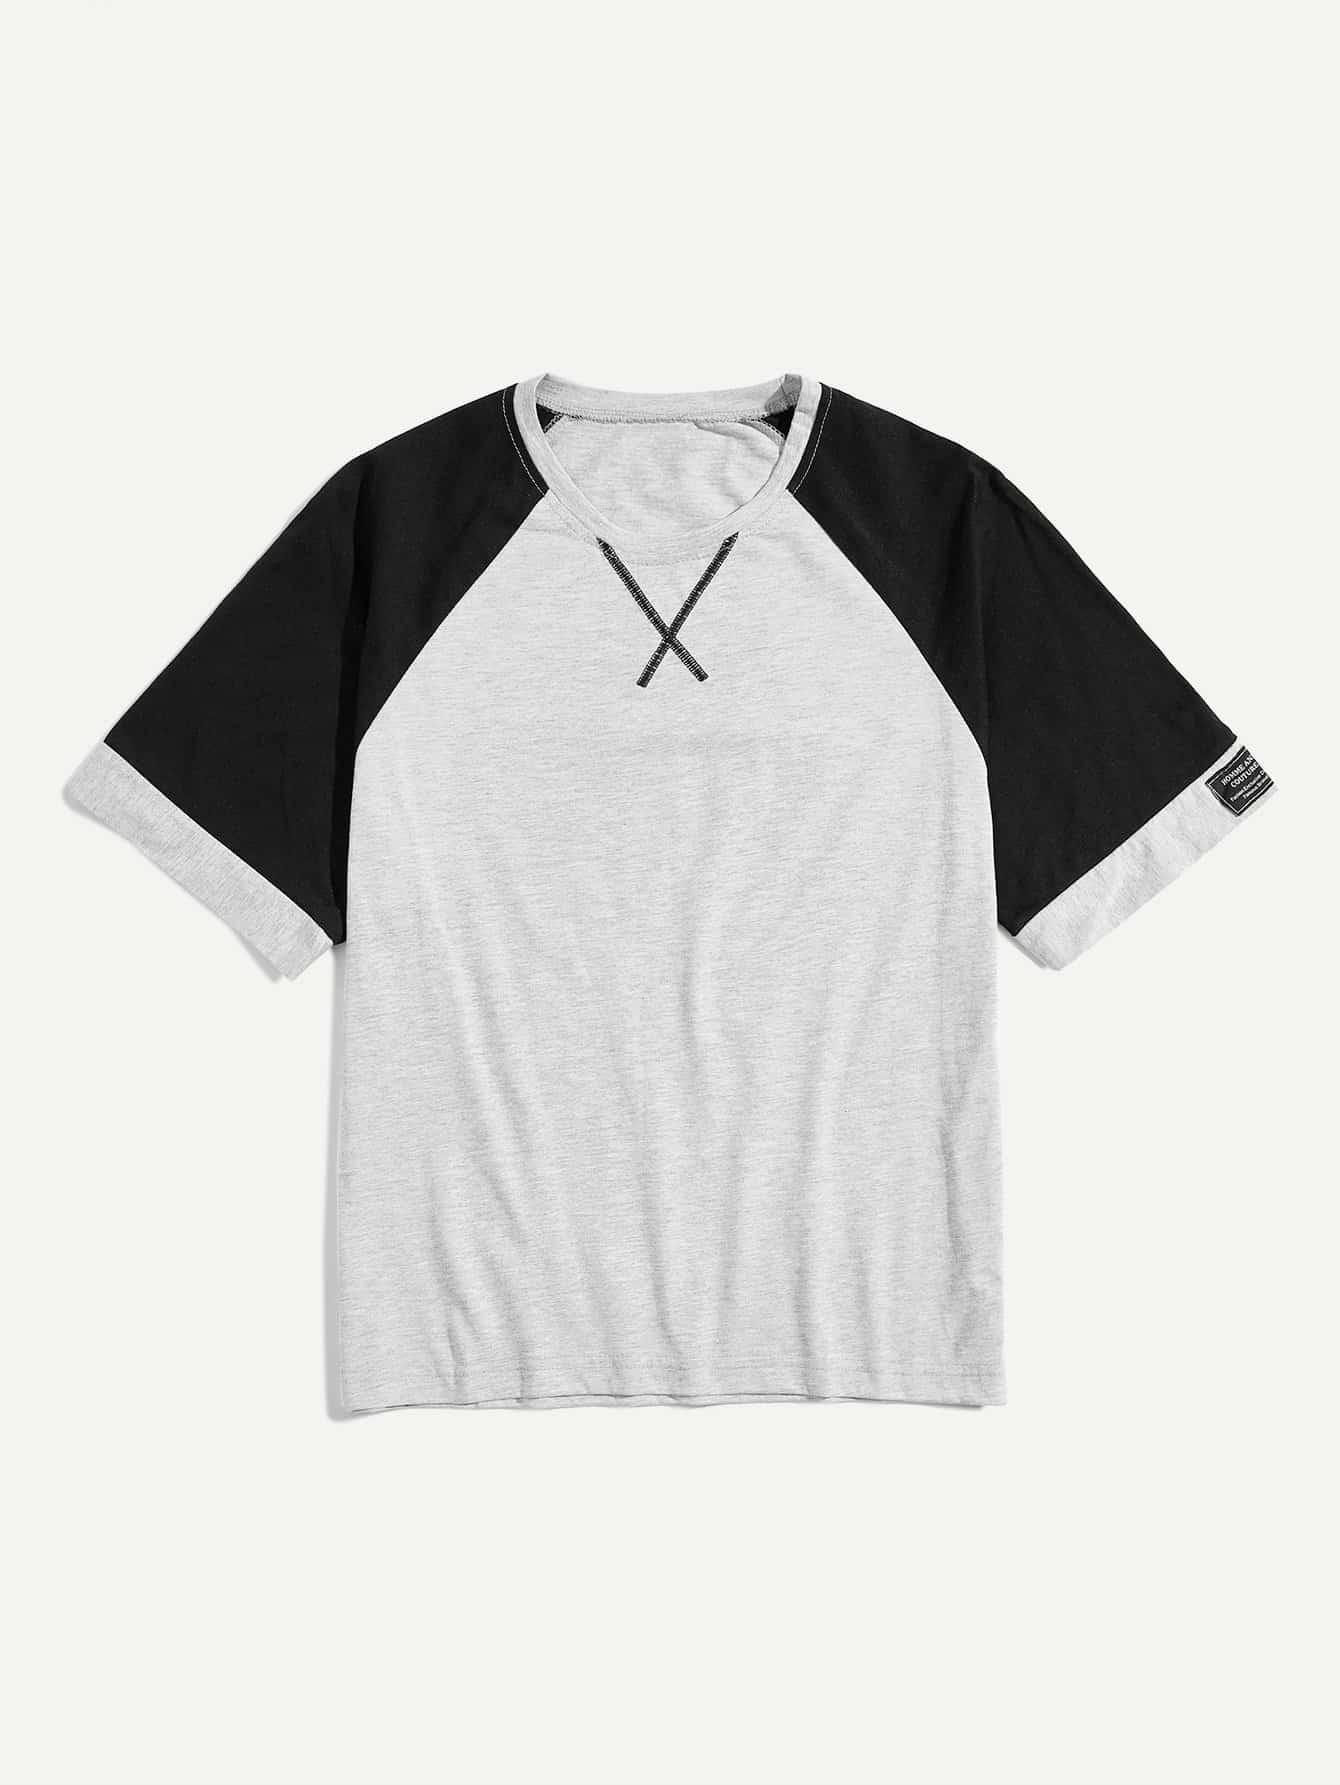 Купить Мужская вышивка Деталь Цветная футболка, null, SheIn